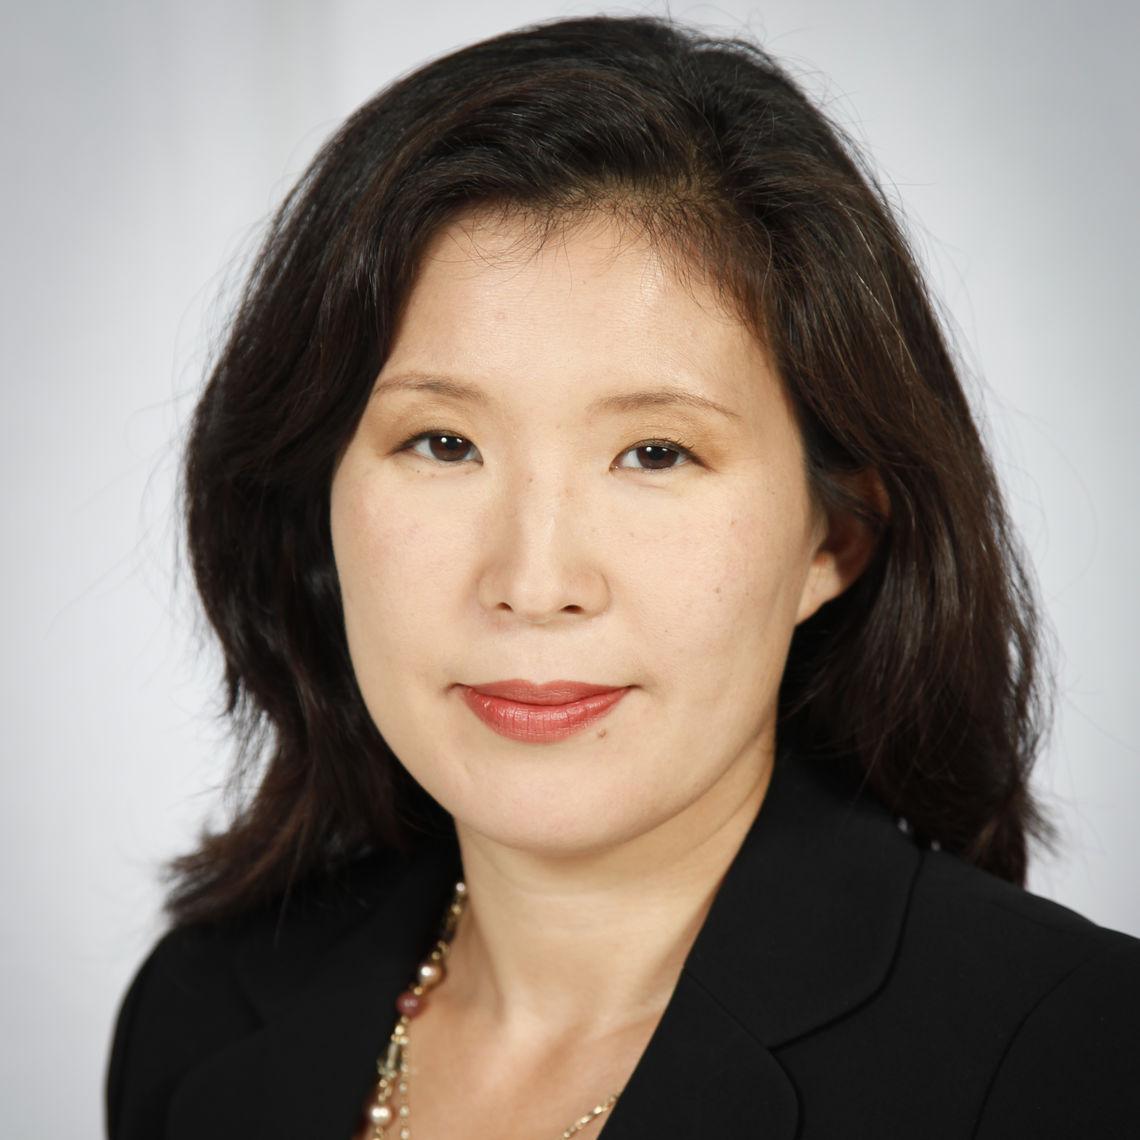 Linda Hasunuma